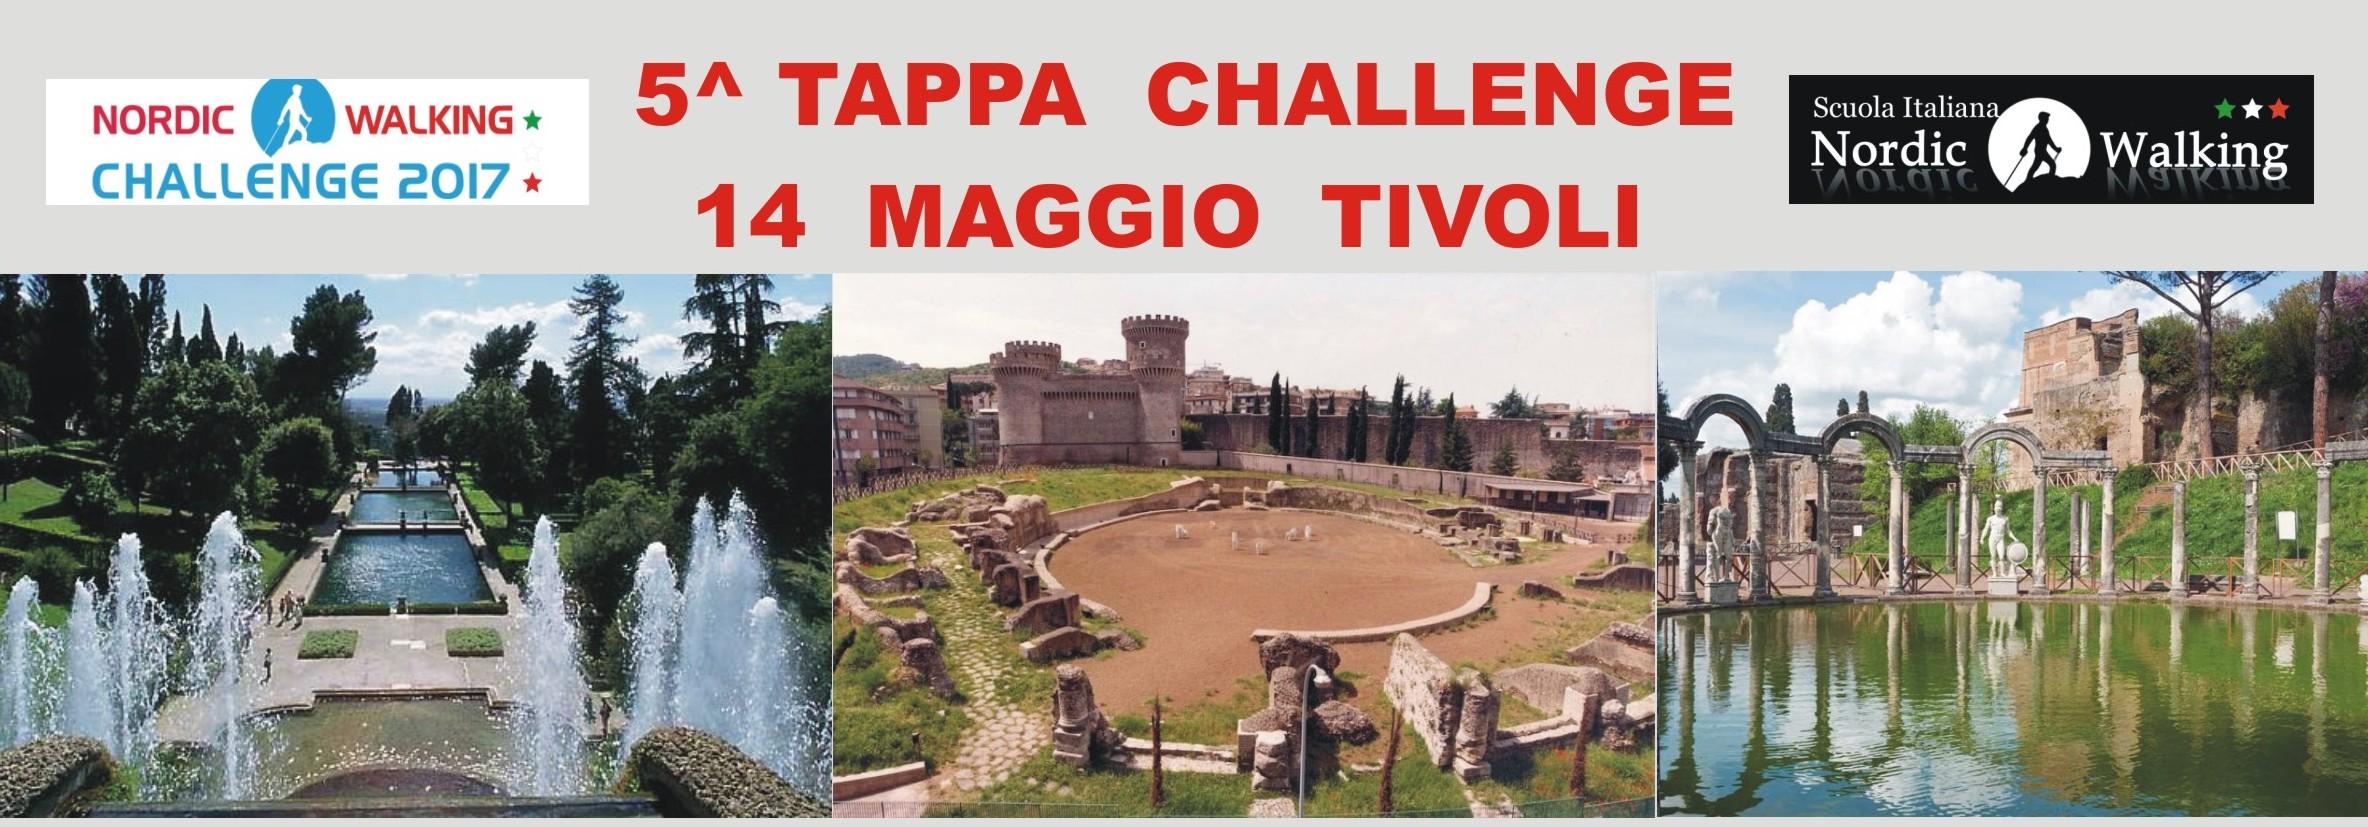 5^ TAPPA CHALLENGE NORDIC WALKING –TIVOLI 14 MAGGIO